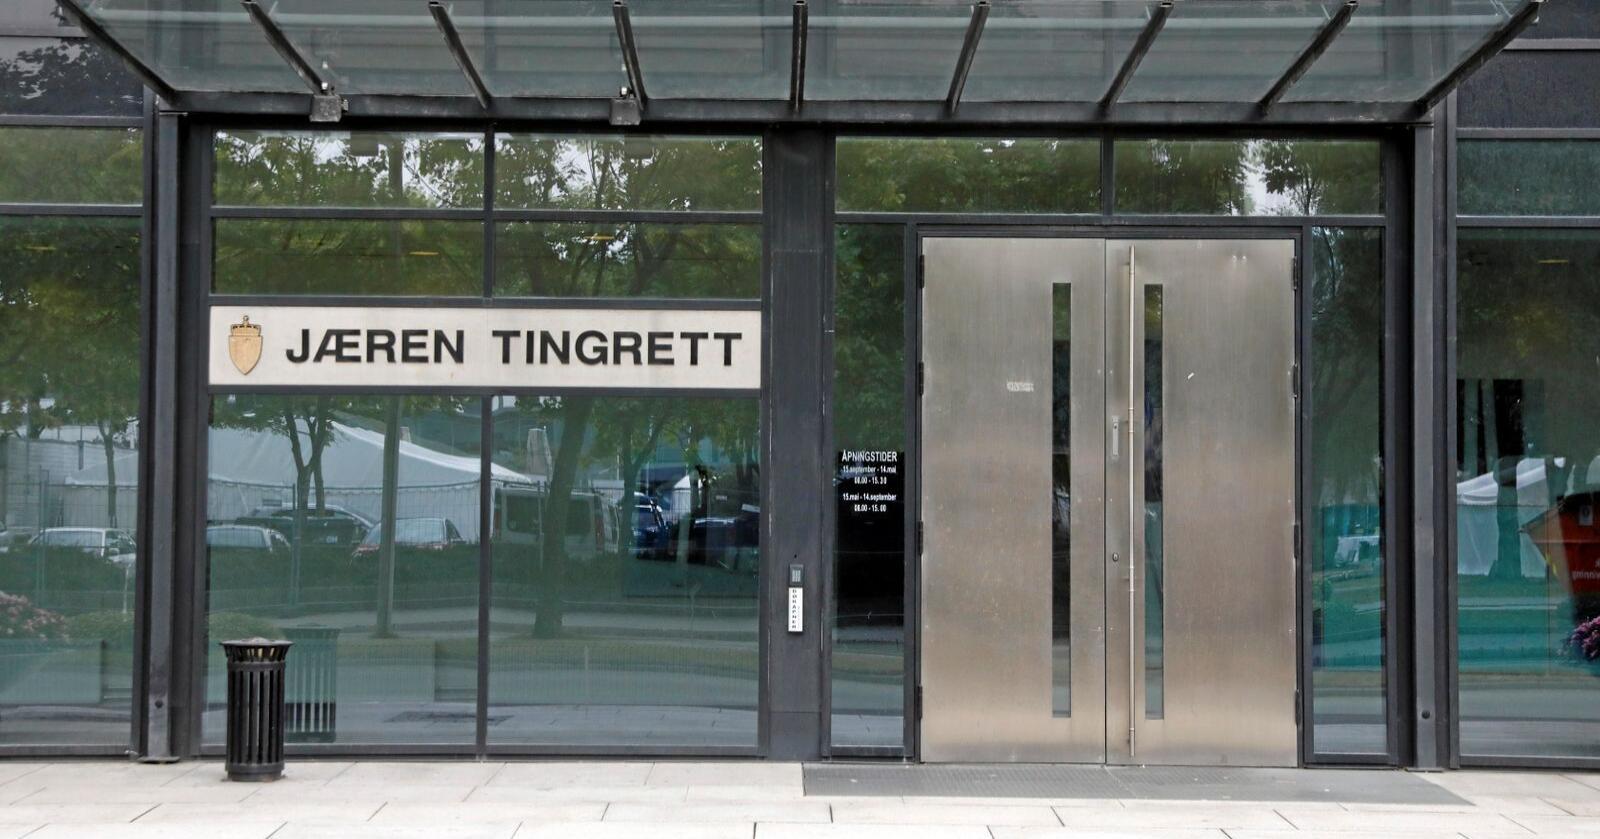 En tidligere pelsdyrbonde er dømt til seks måneders fengse ved Jæren tingrett. Foto: Ole Berg-Rusten / NTB scanpix